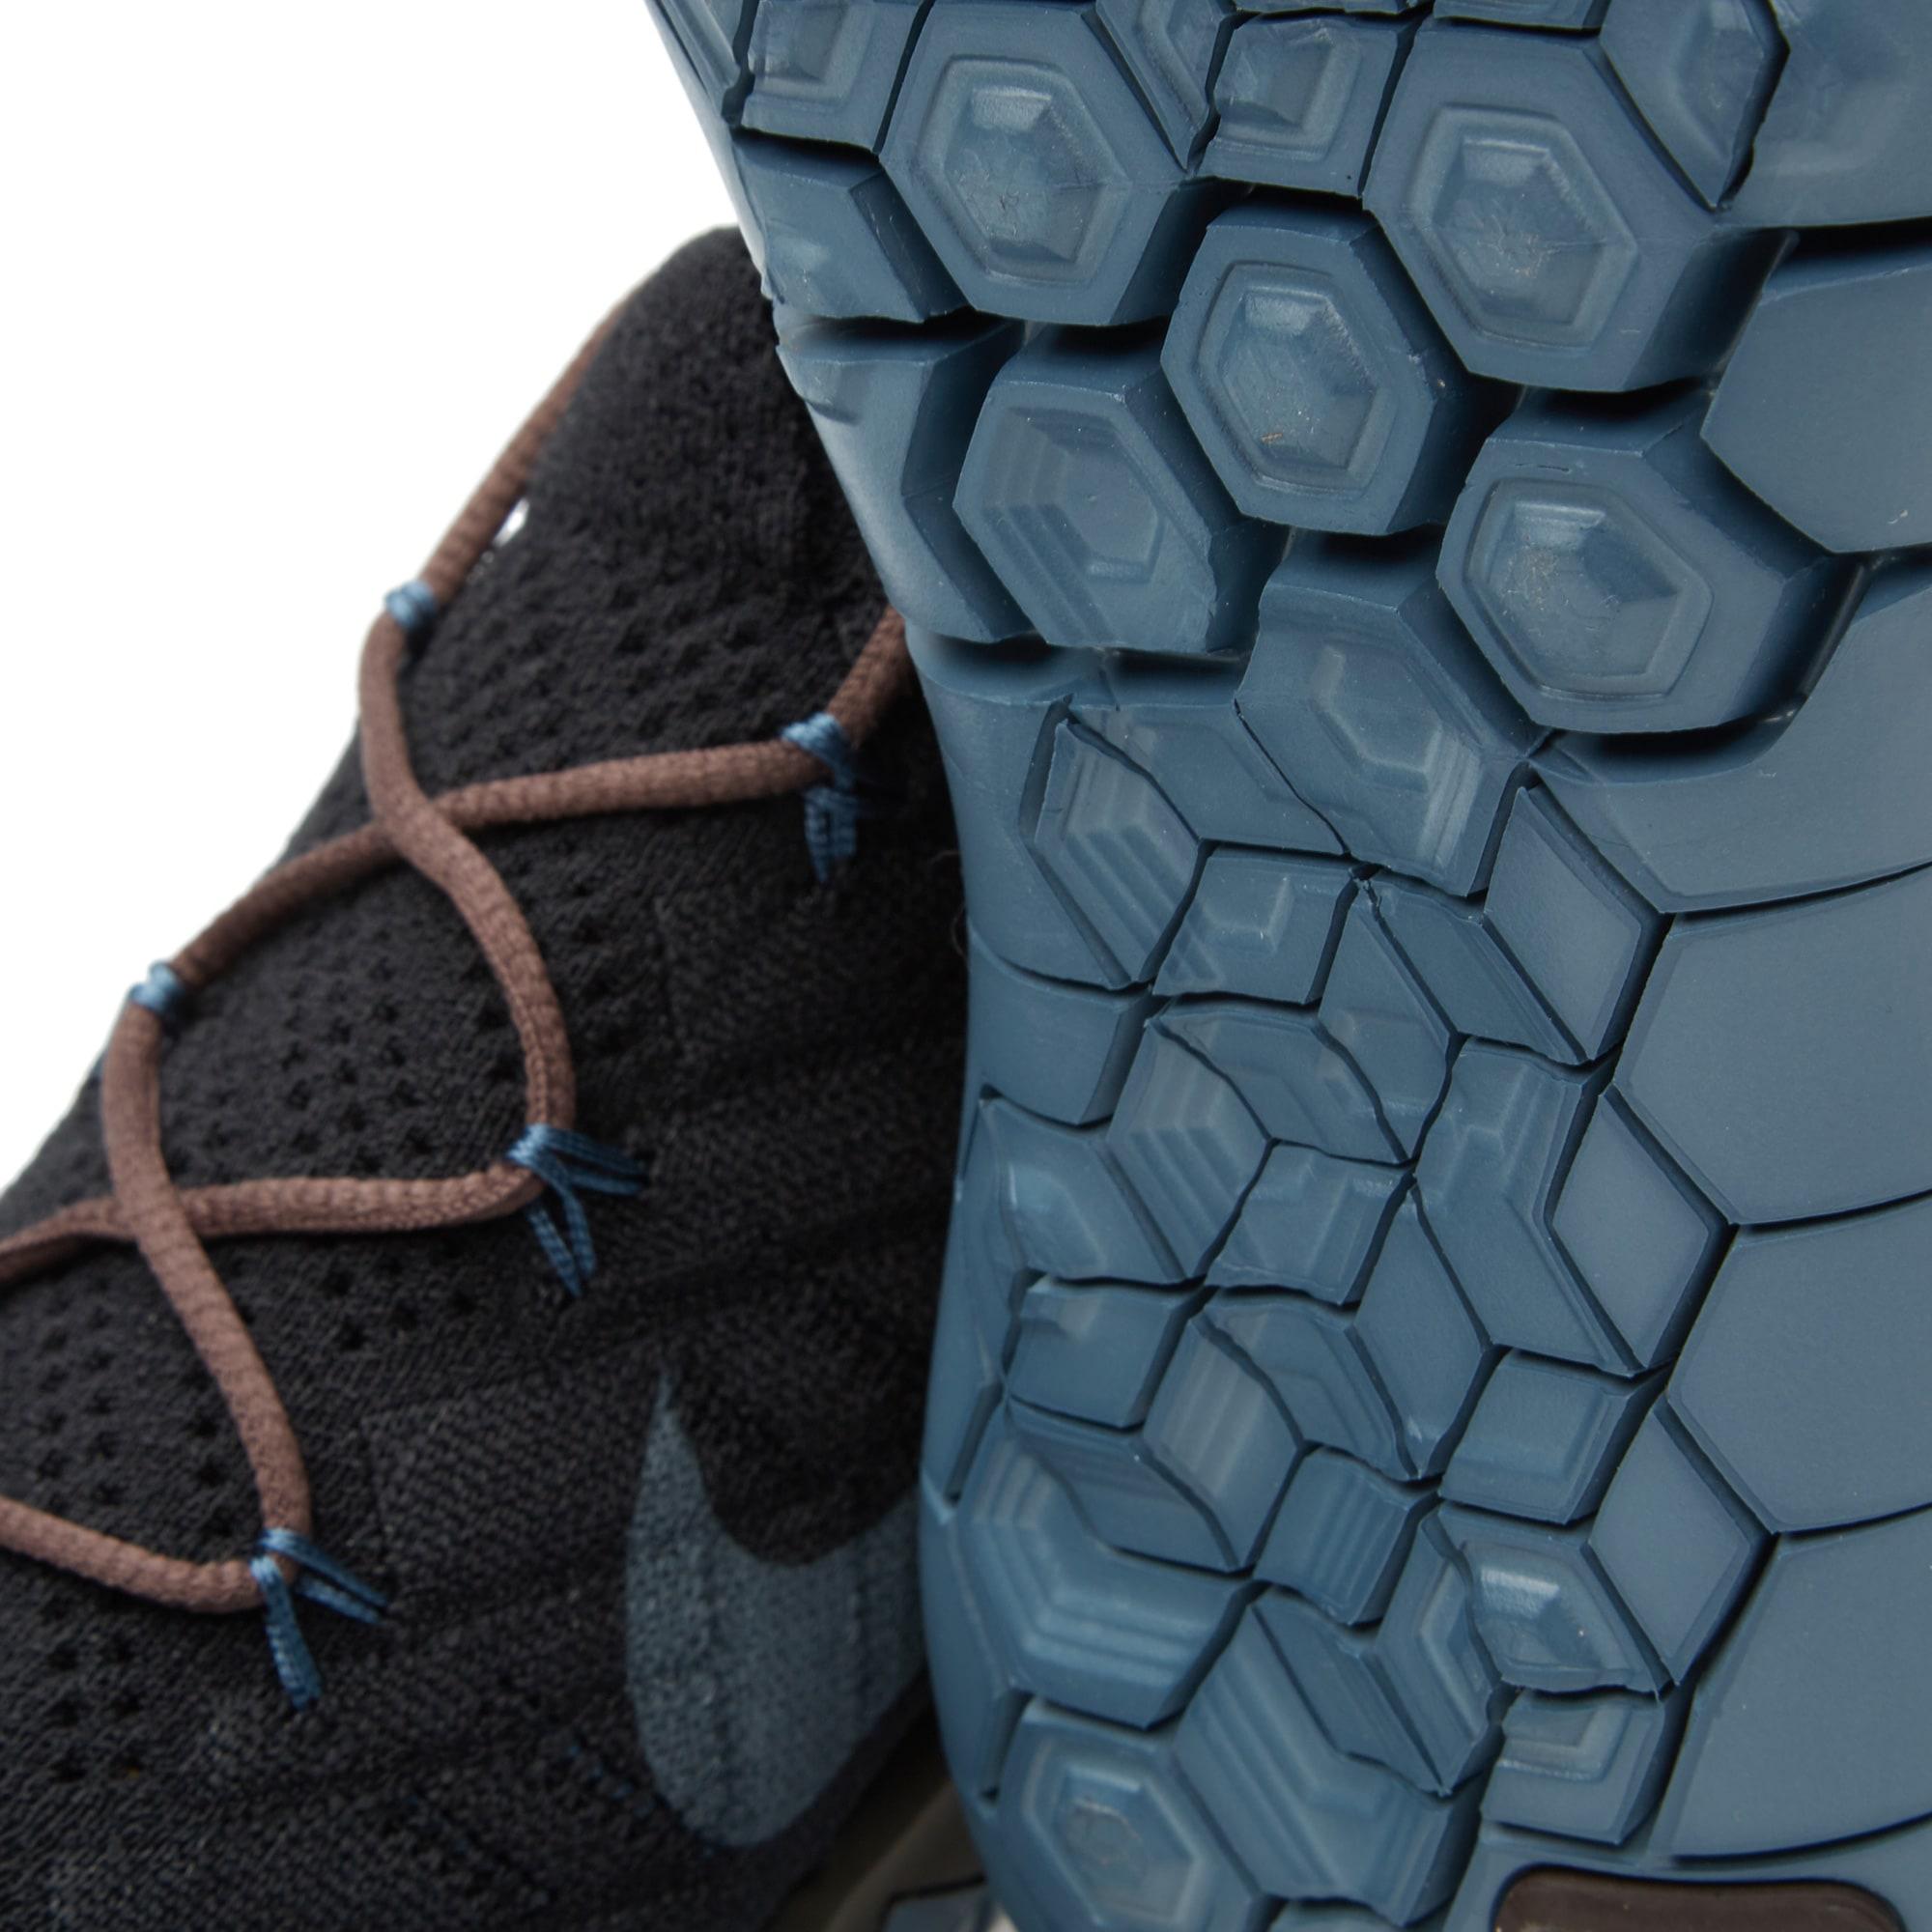 sports shoes aaf72 969f4 Nike x Undercover Gyakusou Free Flyknit 3.0 Black, Baroque Brown   Slate    END.